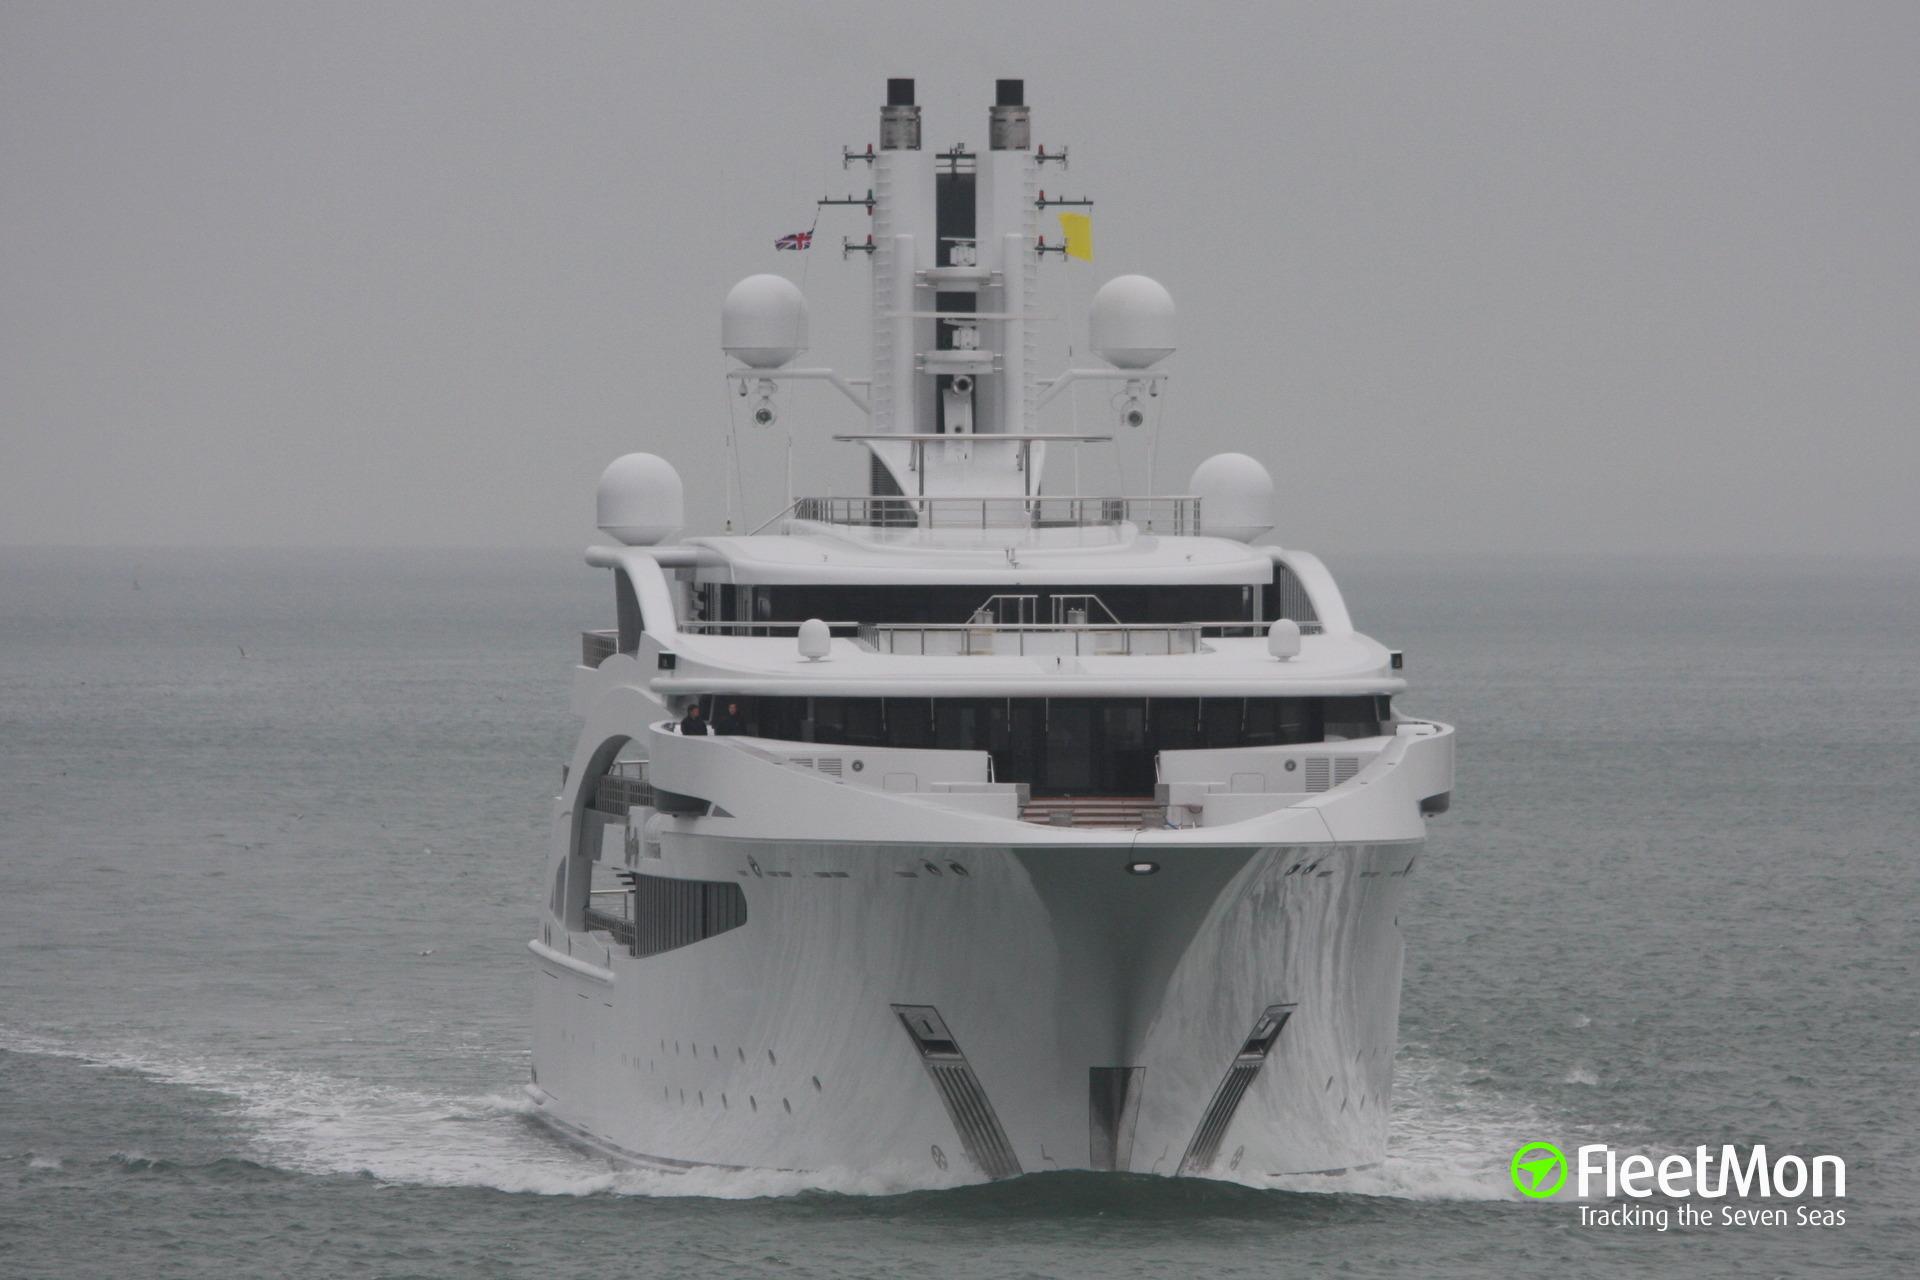 Luxury yacht I Dynasty in trouble off Sri Lanka